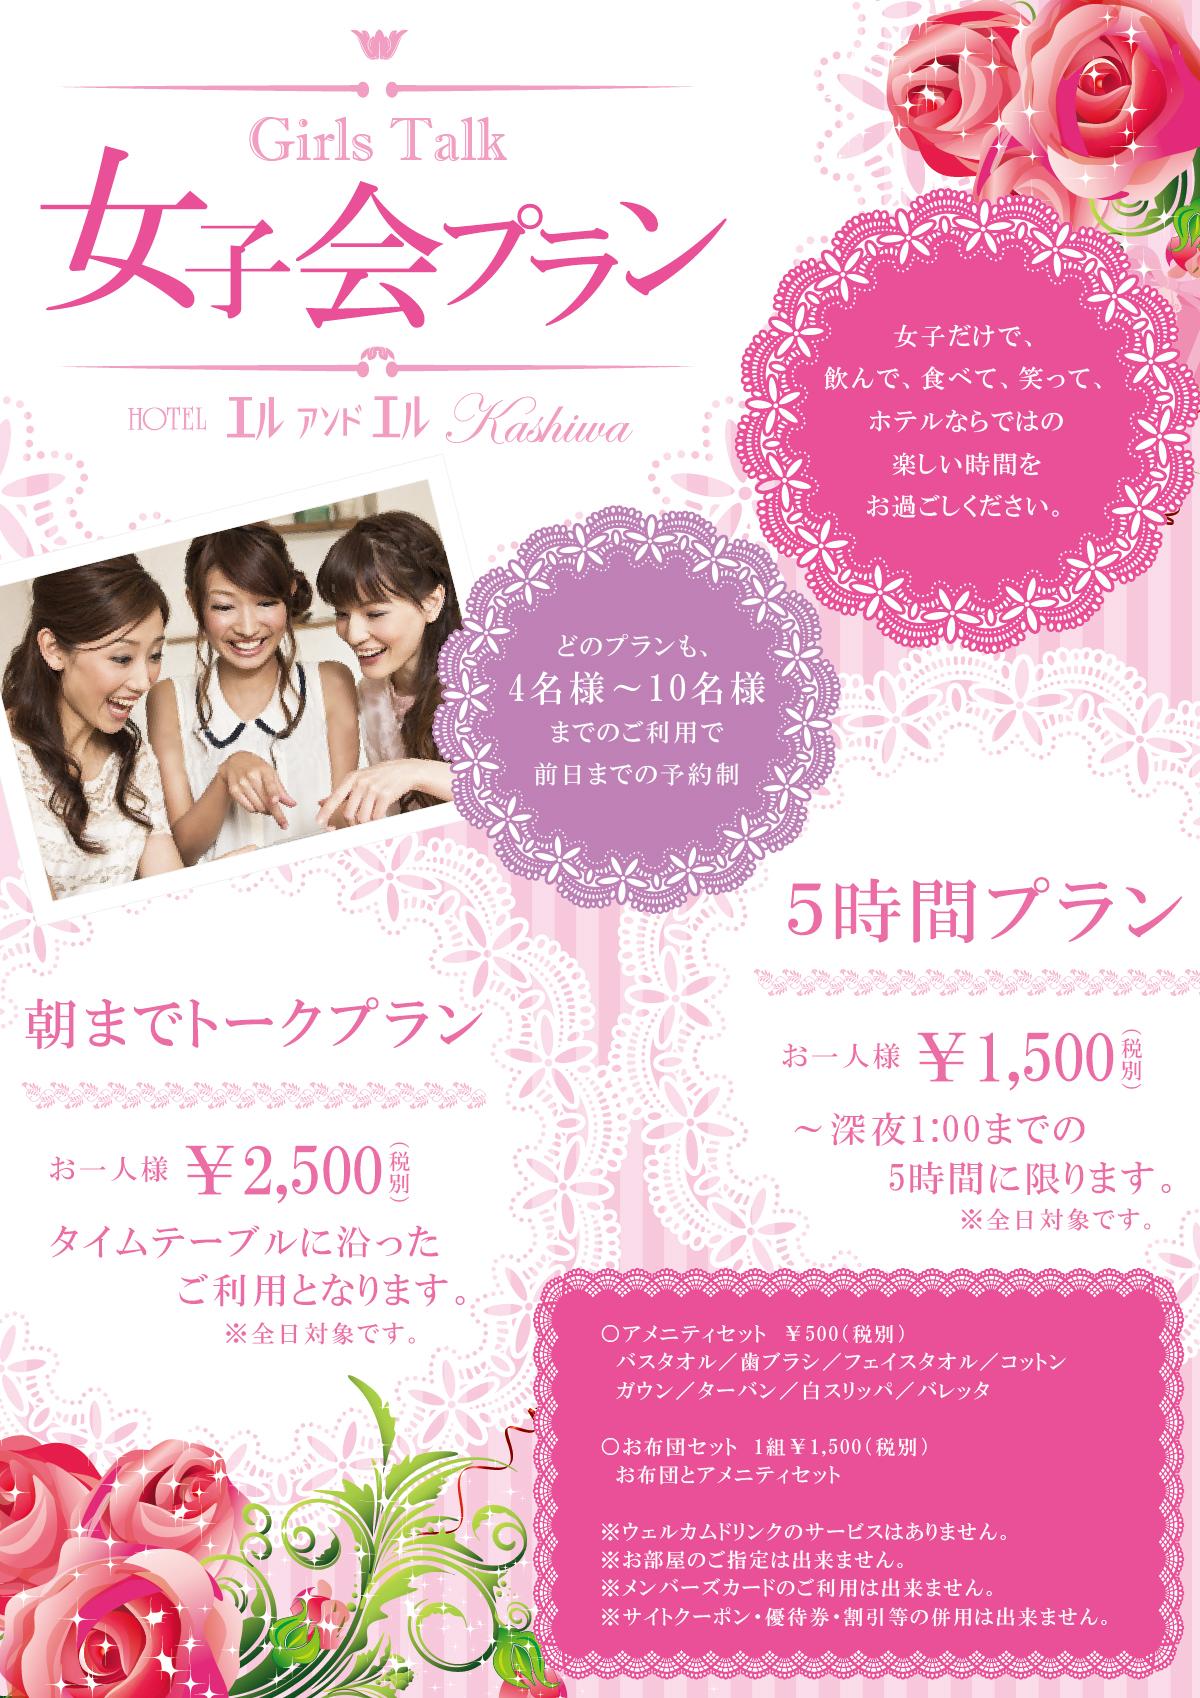 【NEW!!】女子会プラン~Girls Talk~